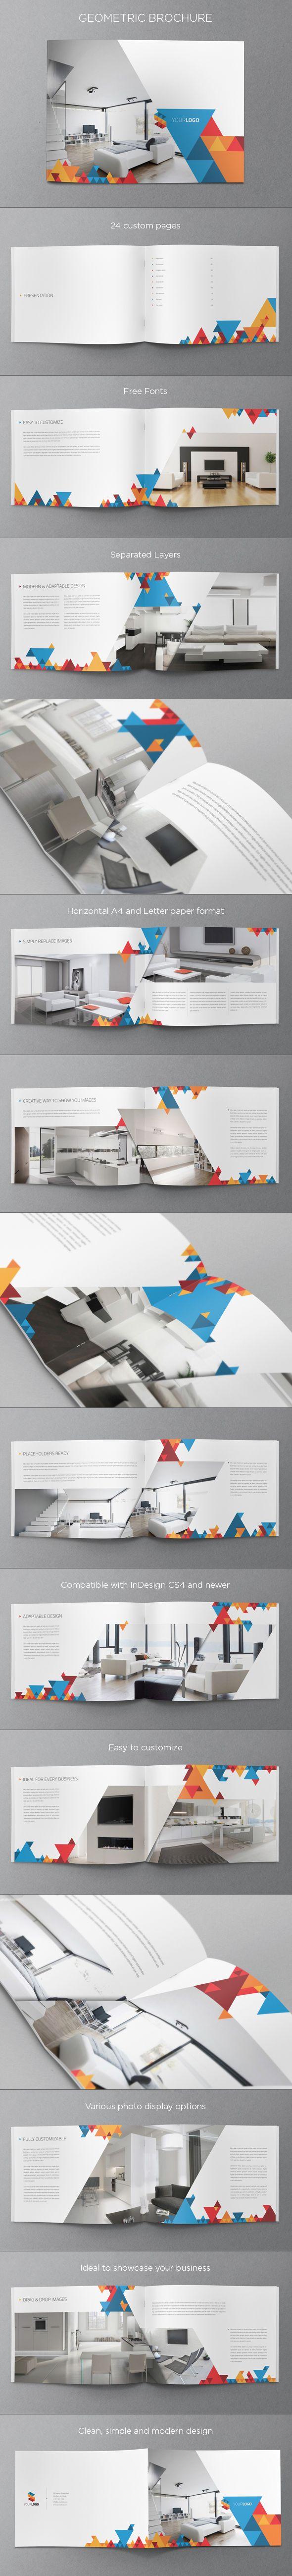 Modern Geometric Brochure. Download here: http://graphicriver.net/item/modern-geometric-brochure/5427360?ref=abradesign #design #brochure